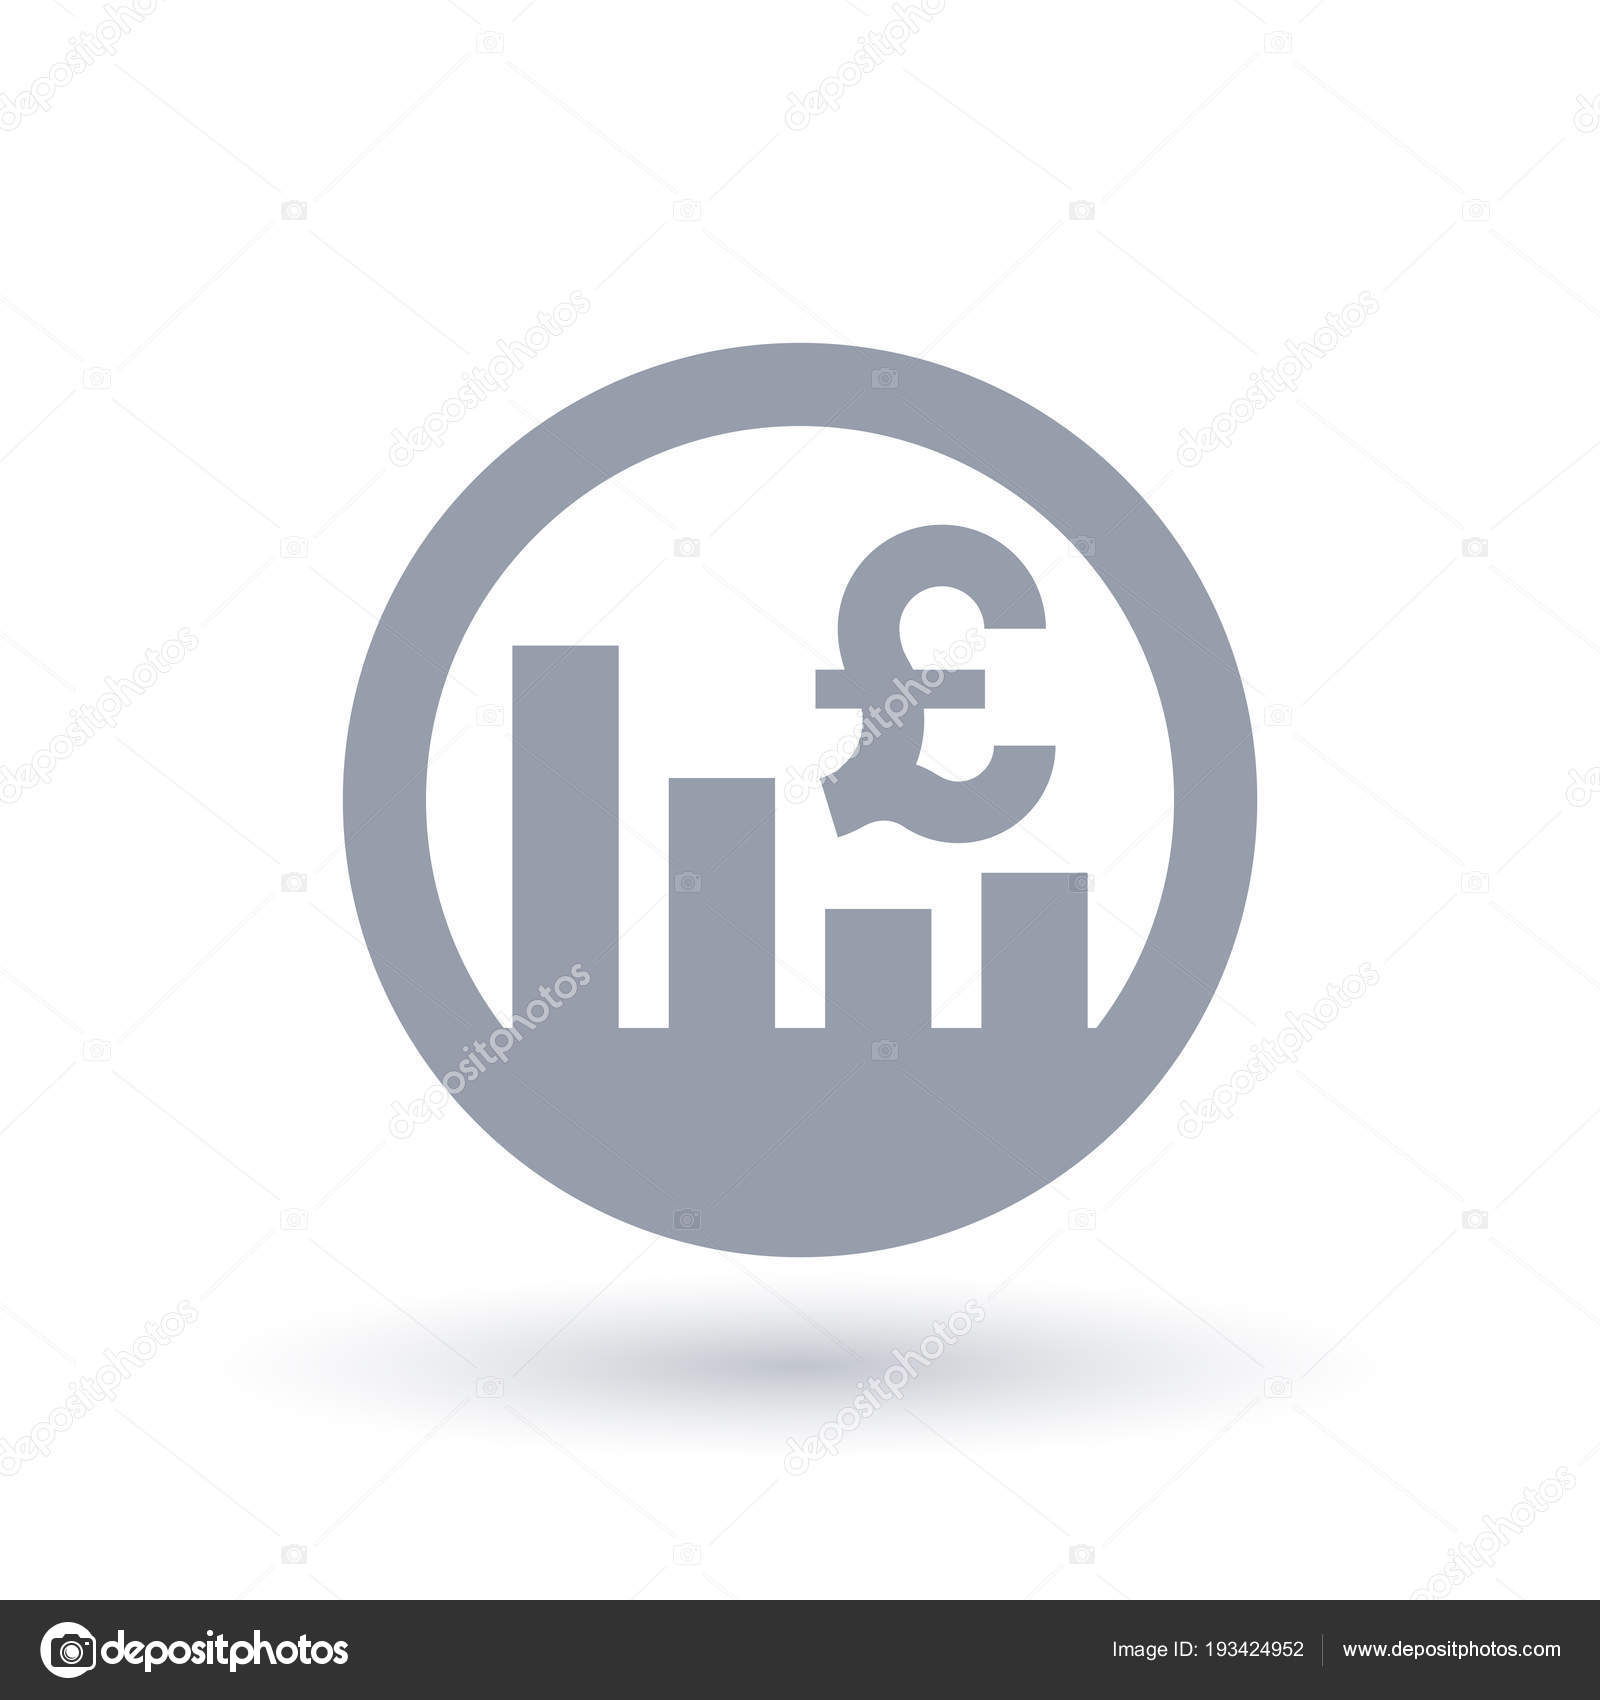 British Pound Stock Market Icon Great Britain Currency Exchange